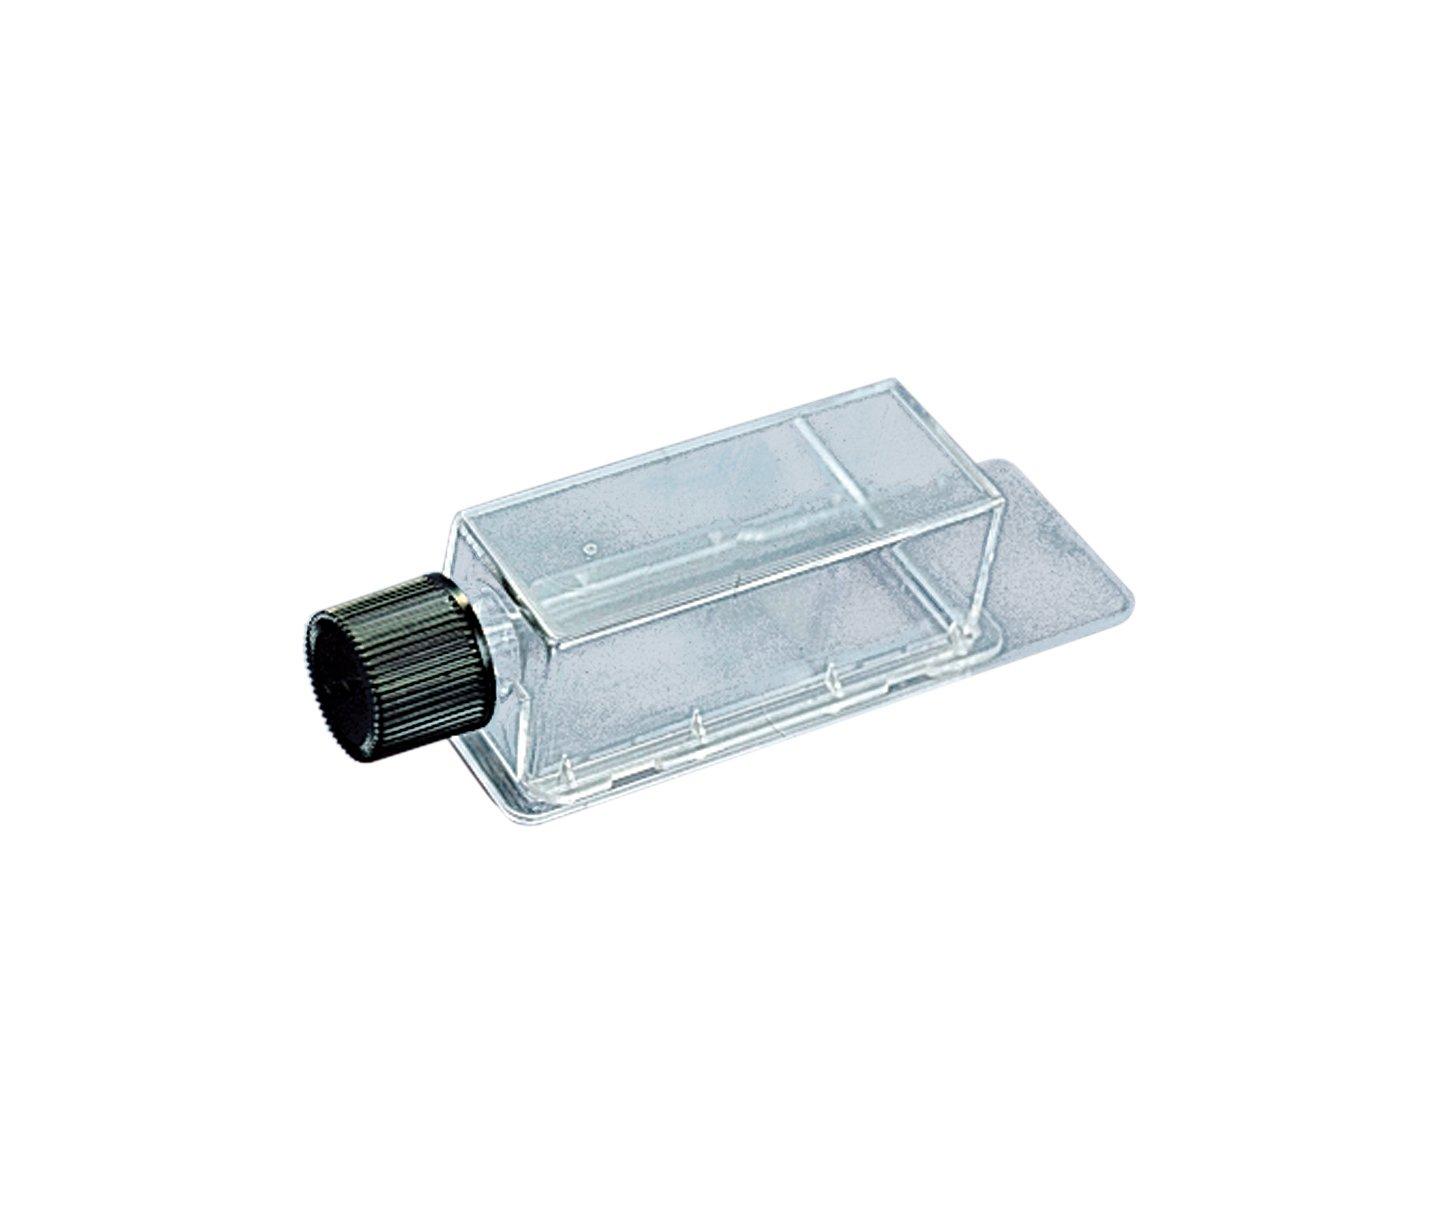 Nunc Flaskette Tissue Culture Chamber Slide Flask, Working Volume 2.5-5ml (Case of 96)